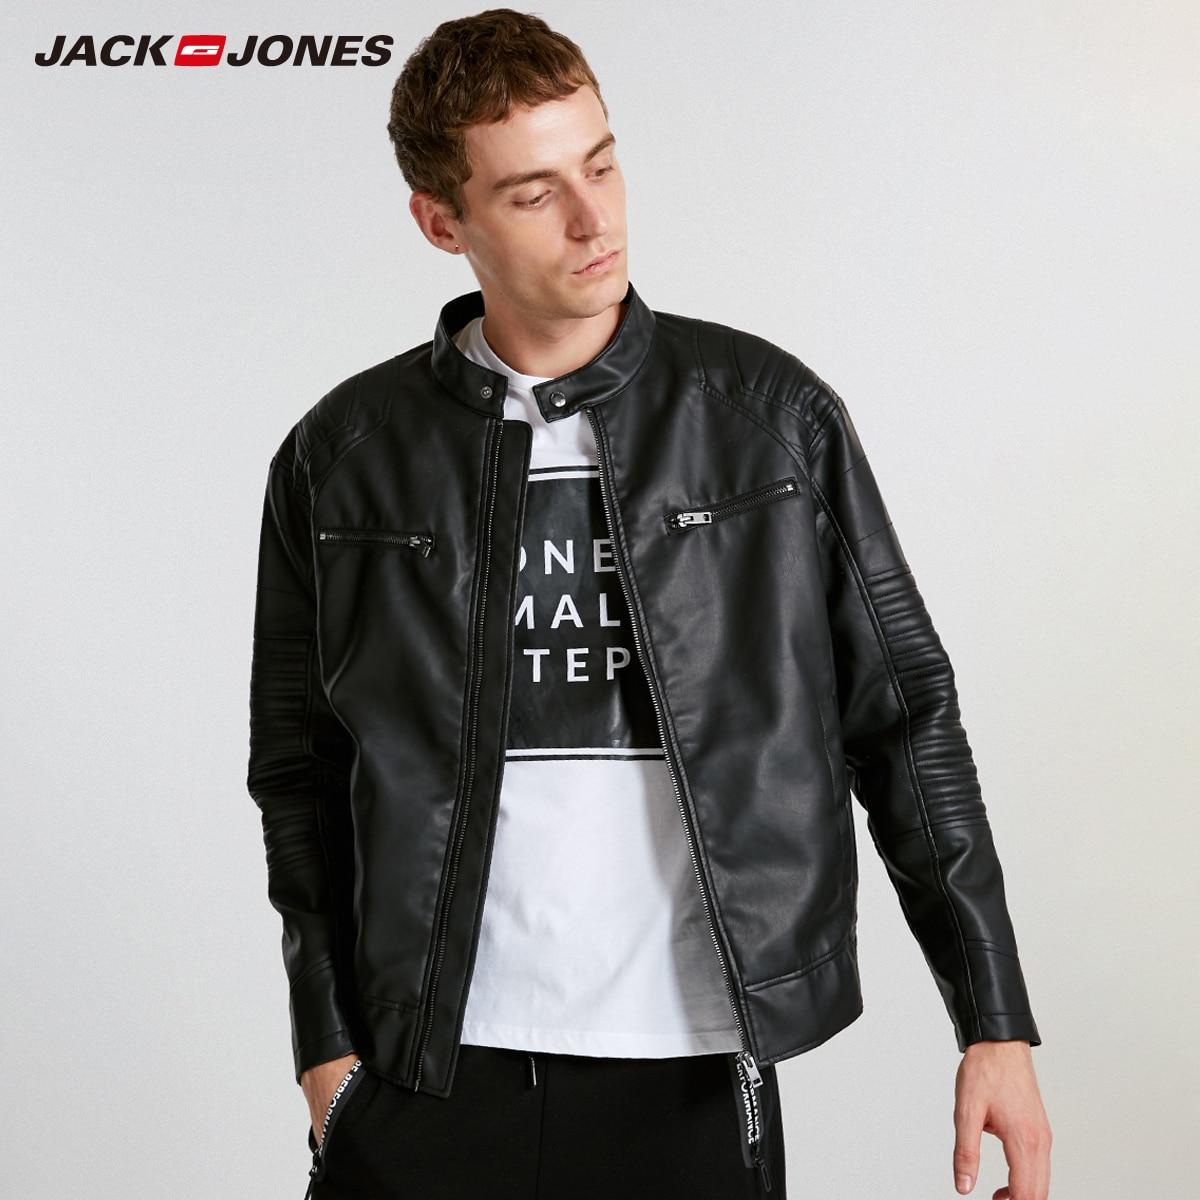 indigo selvage unwashed vintage hand made top quality super heavy 16oz raw denim jacket